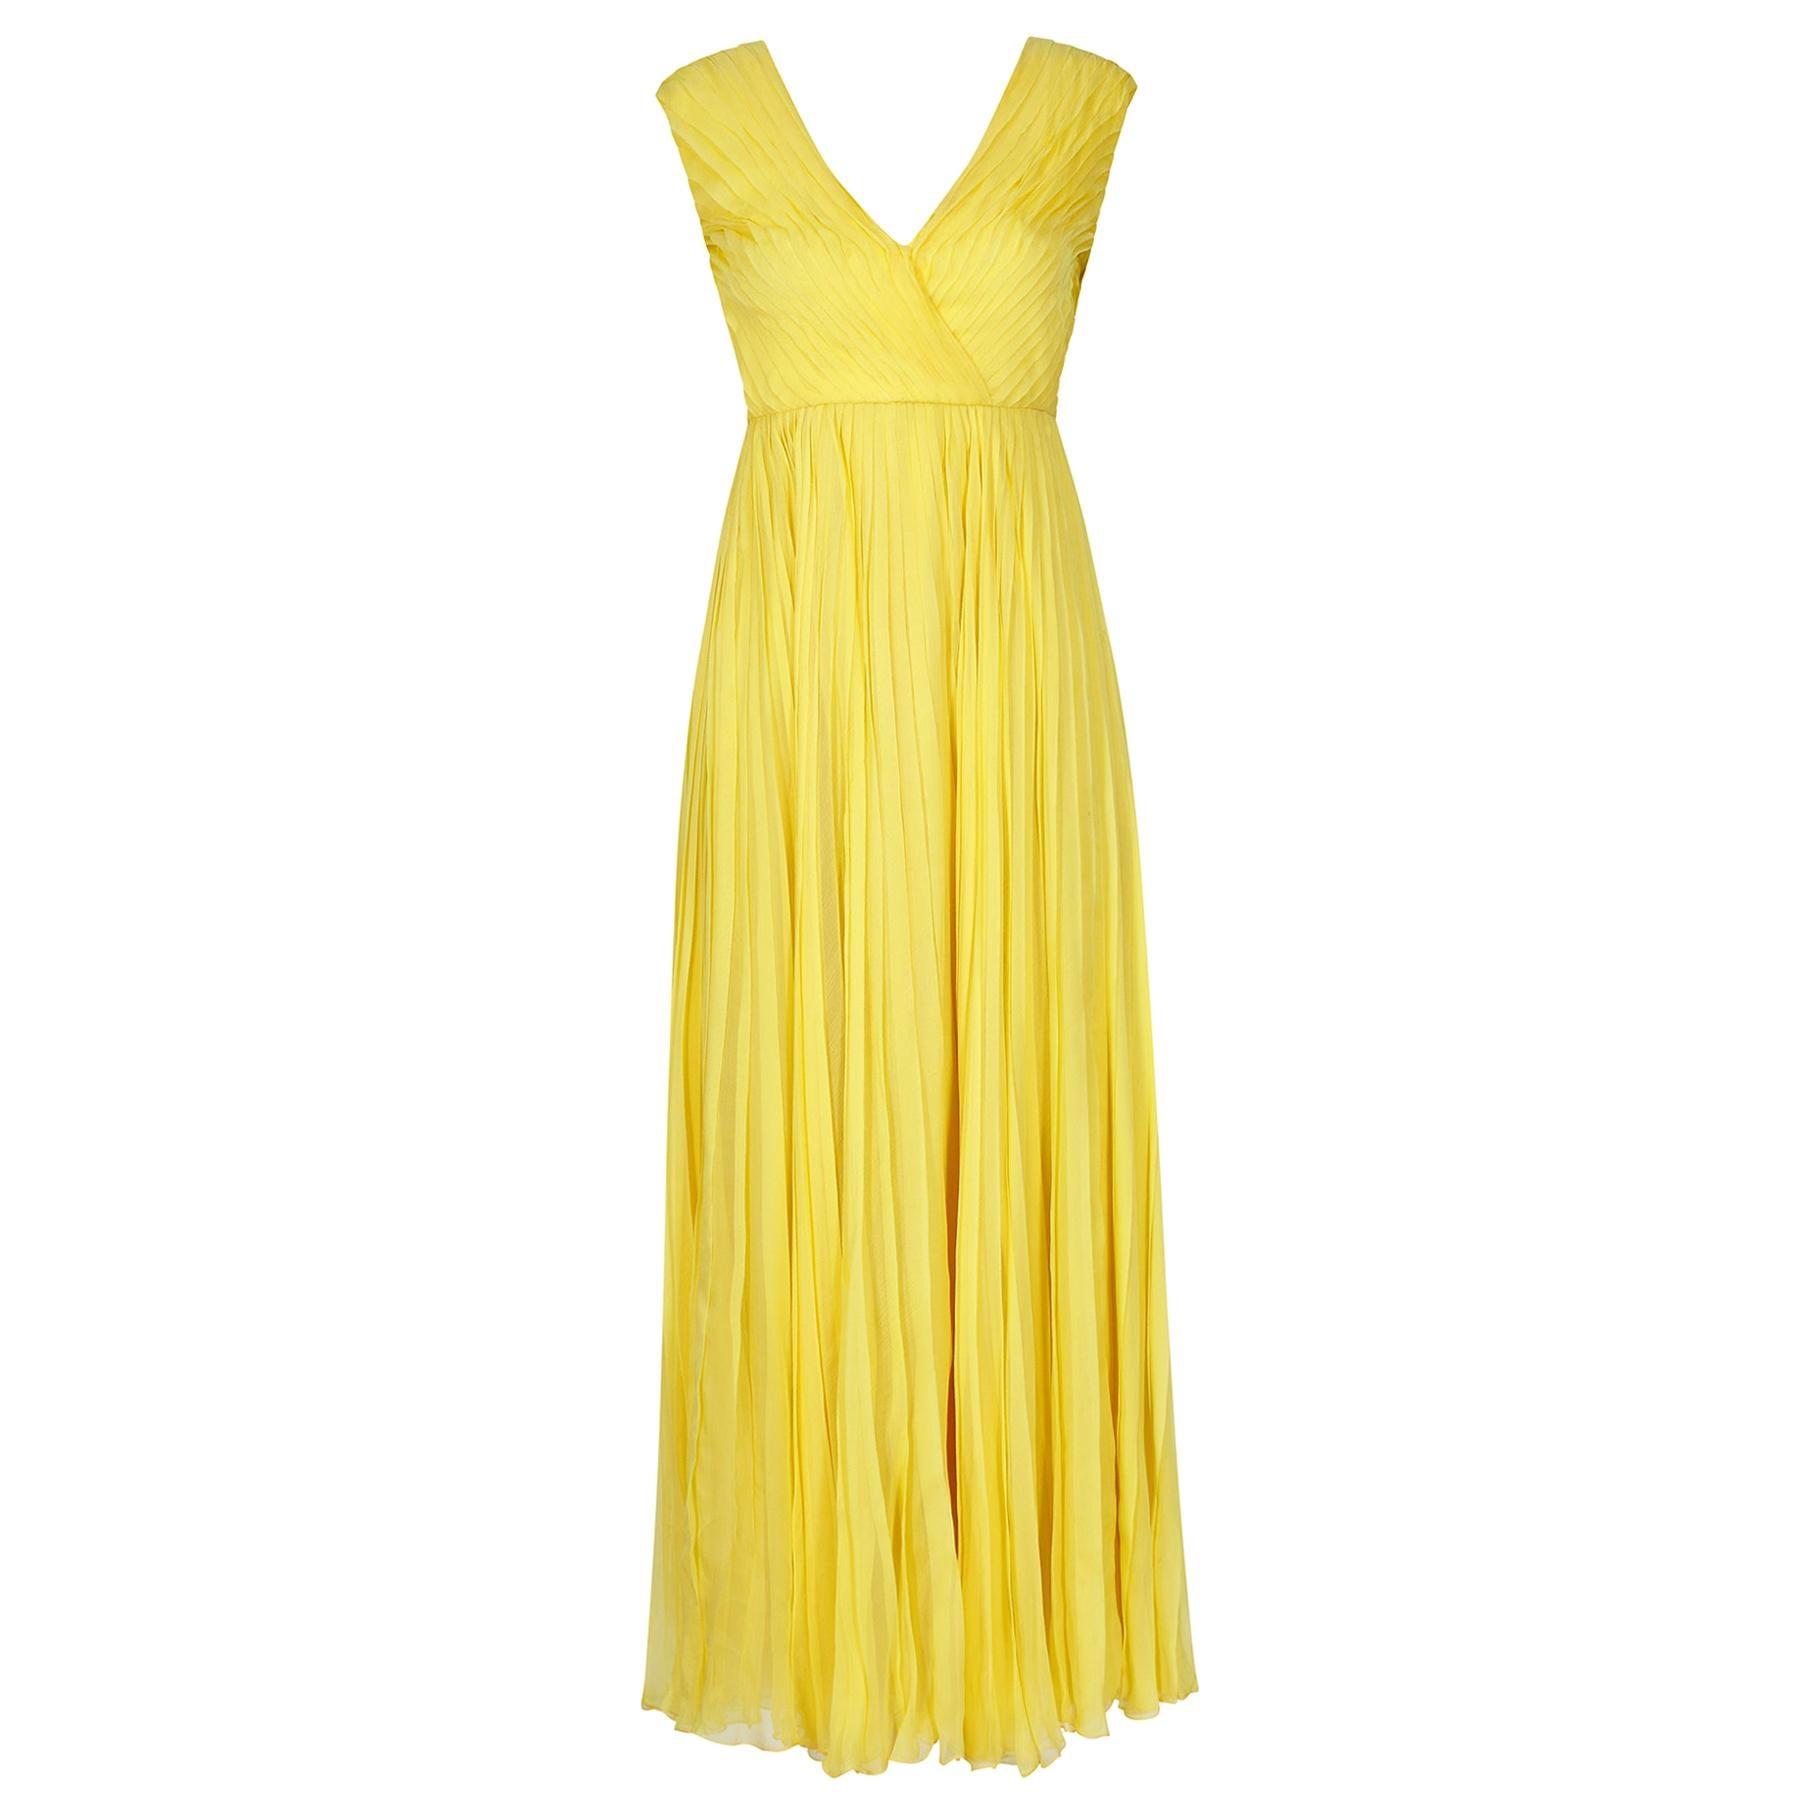 1970s Ted Lapidus Lemon Yellow Pleated Chiffon Dress